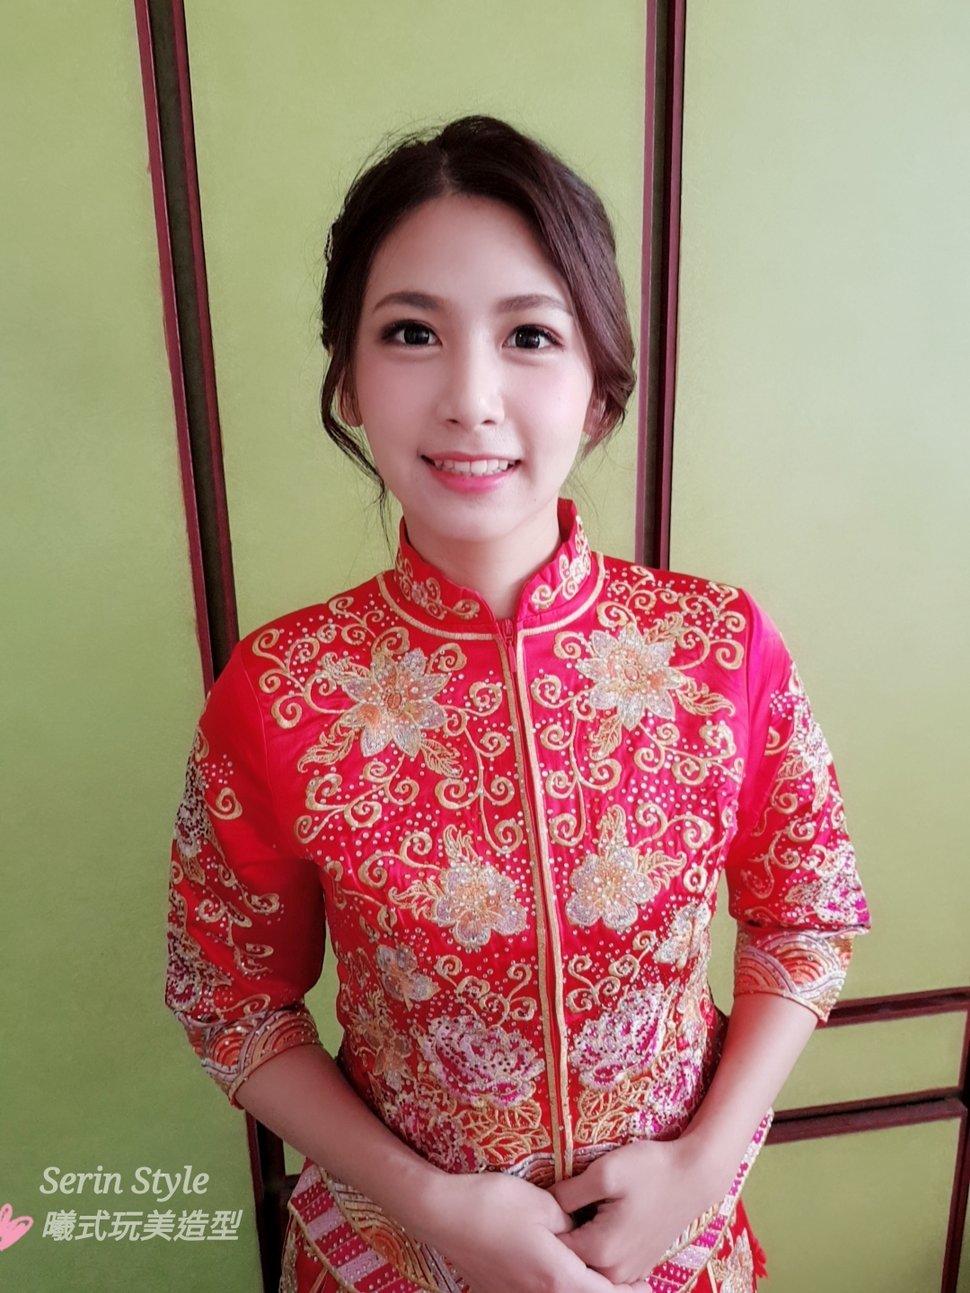 Serinmakeup新秘龍鳳褂造型1 - Serin Style曦式玩美造型《結婚吧》